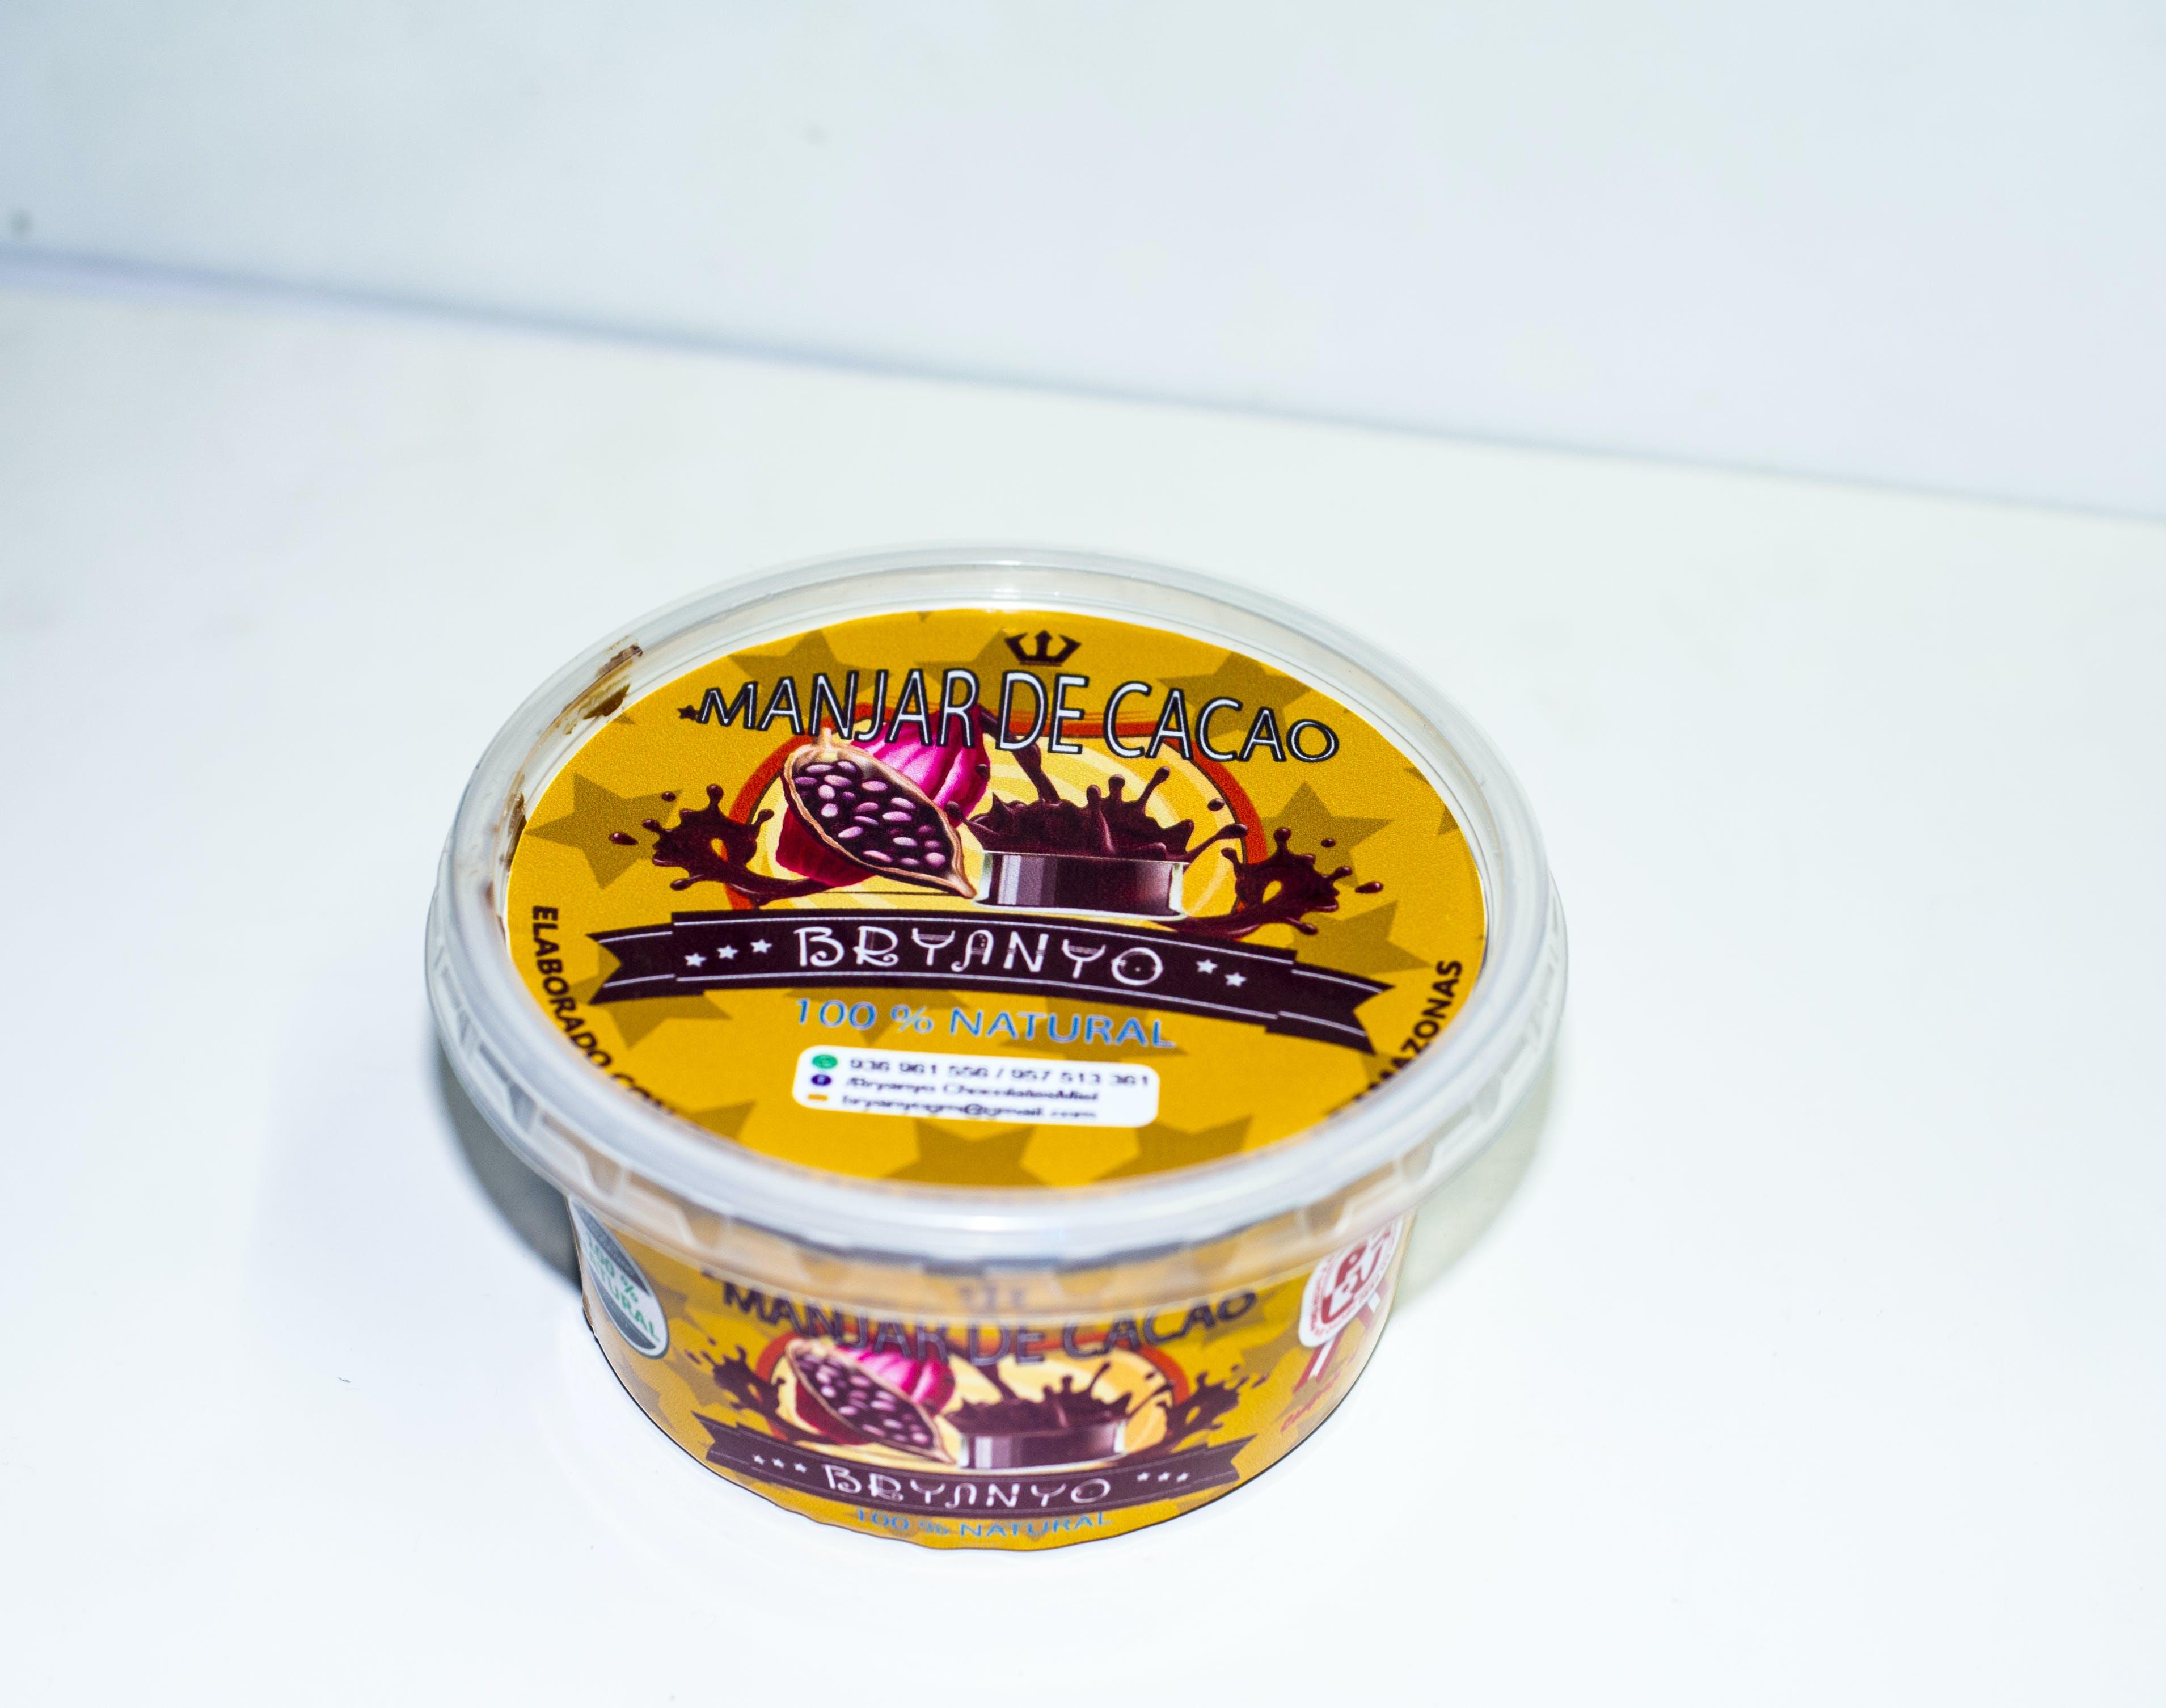 Free stock photo of manjar de cacao chocolate branyo peru